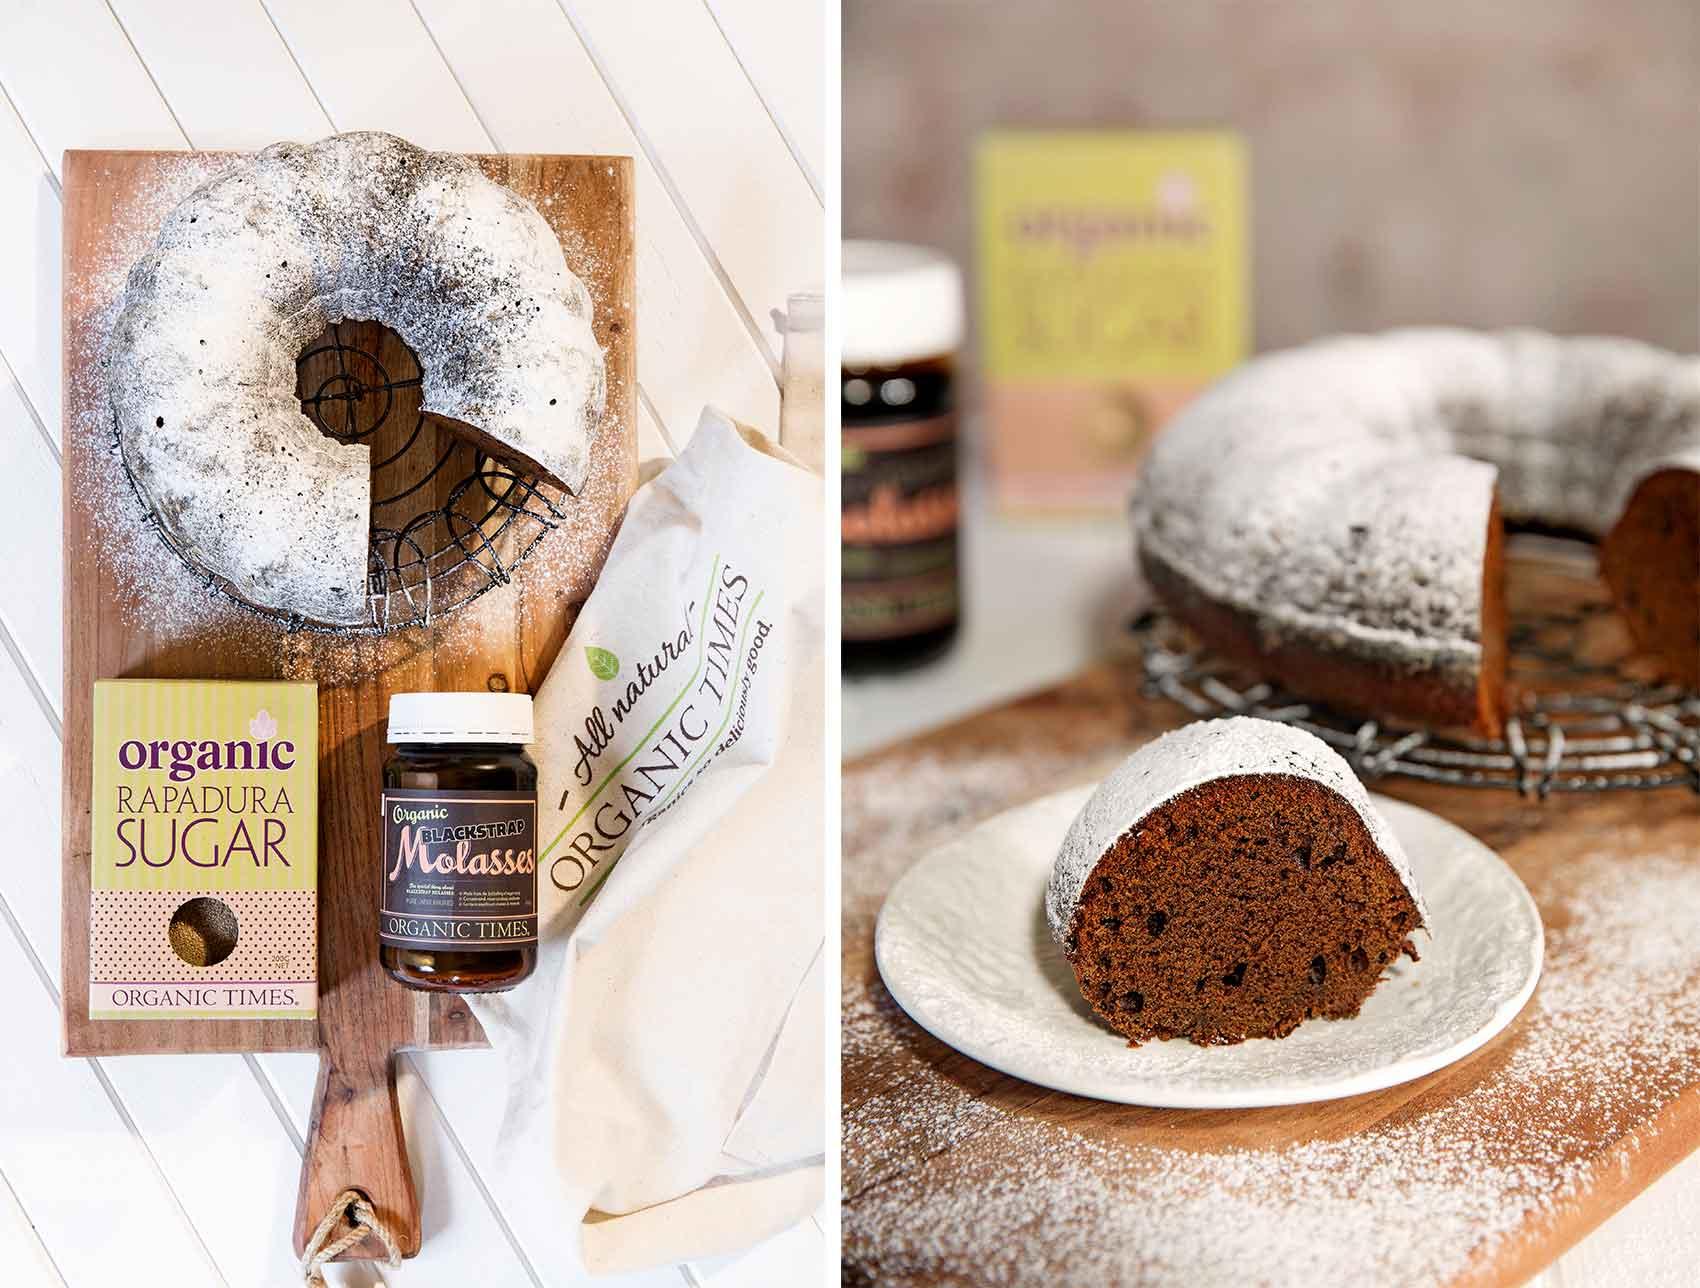 Gingerbread Cake slices with a jar of Organic Times Molasses and Rapadura Sugar